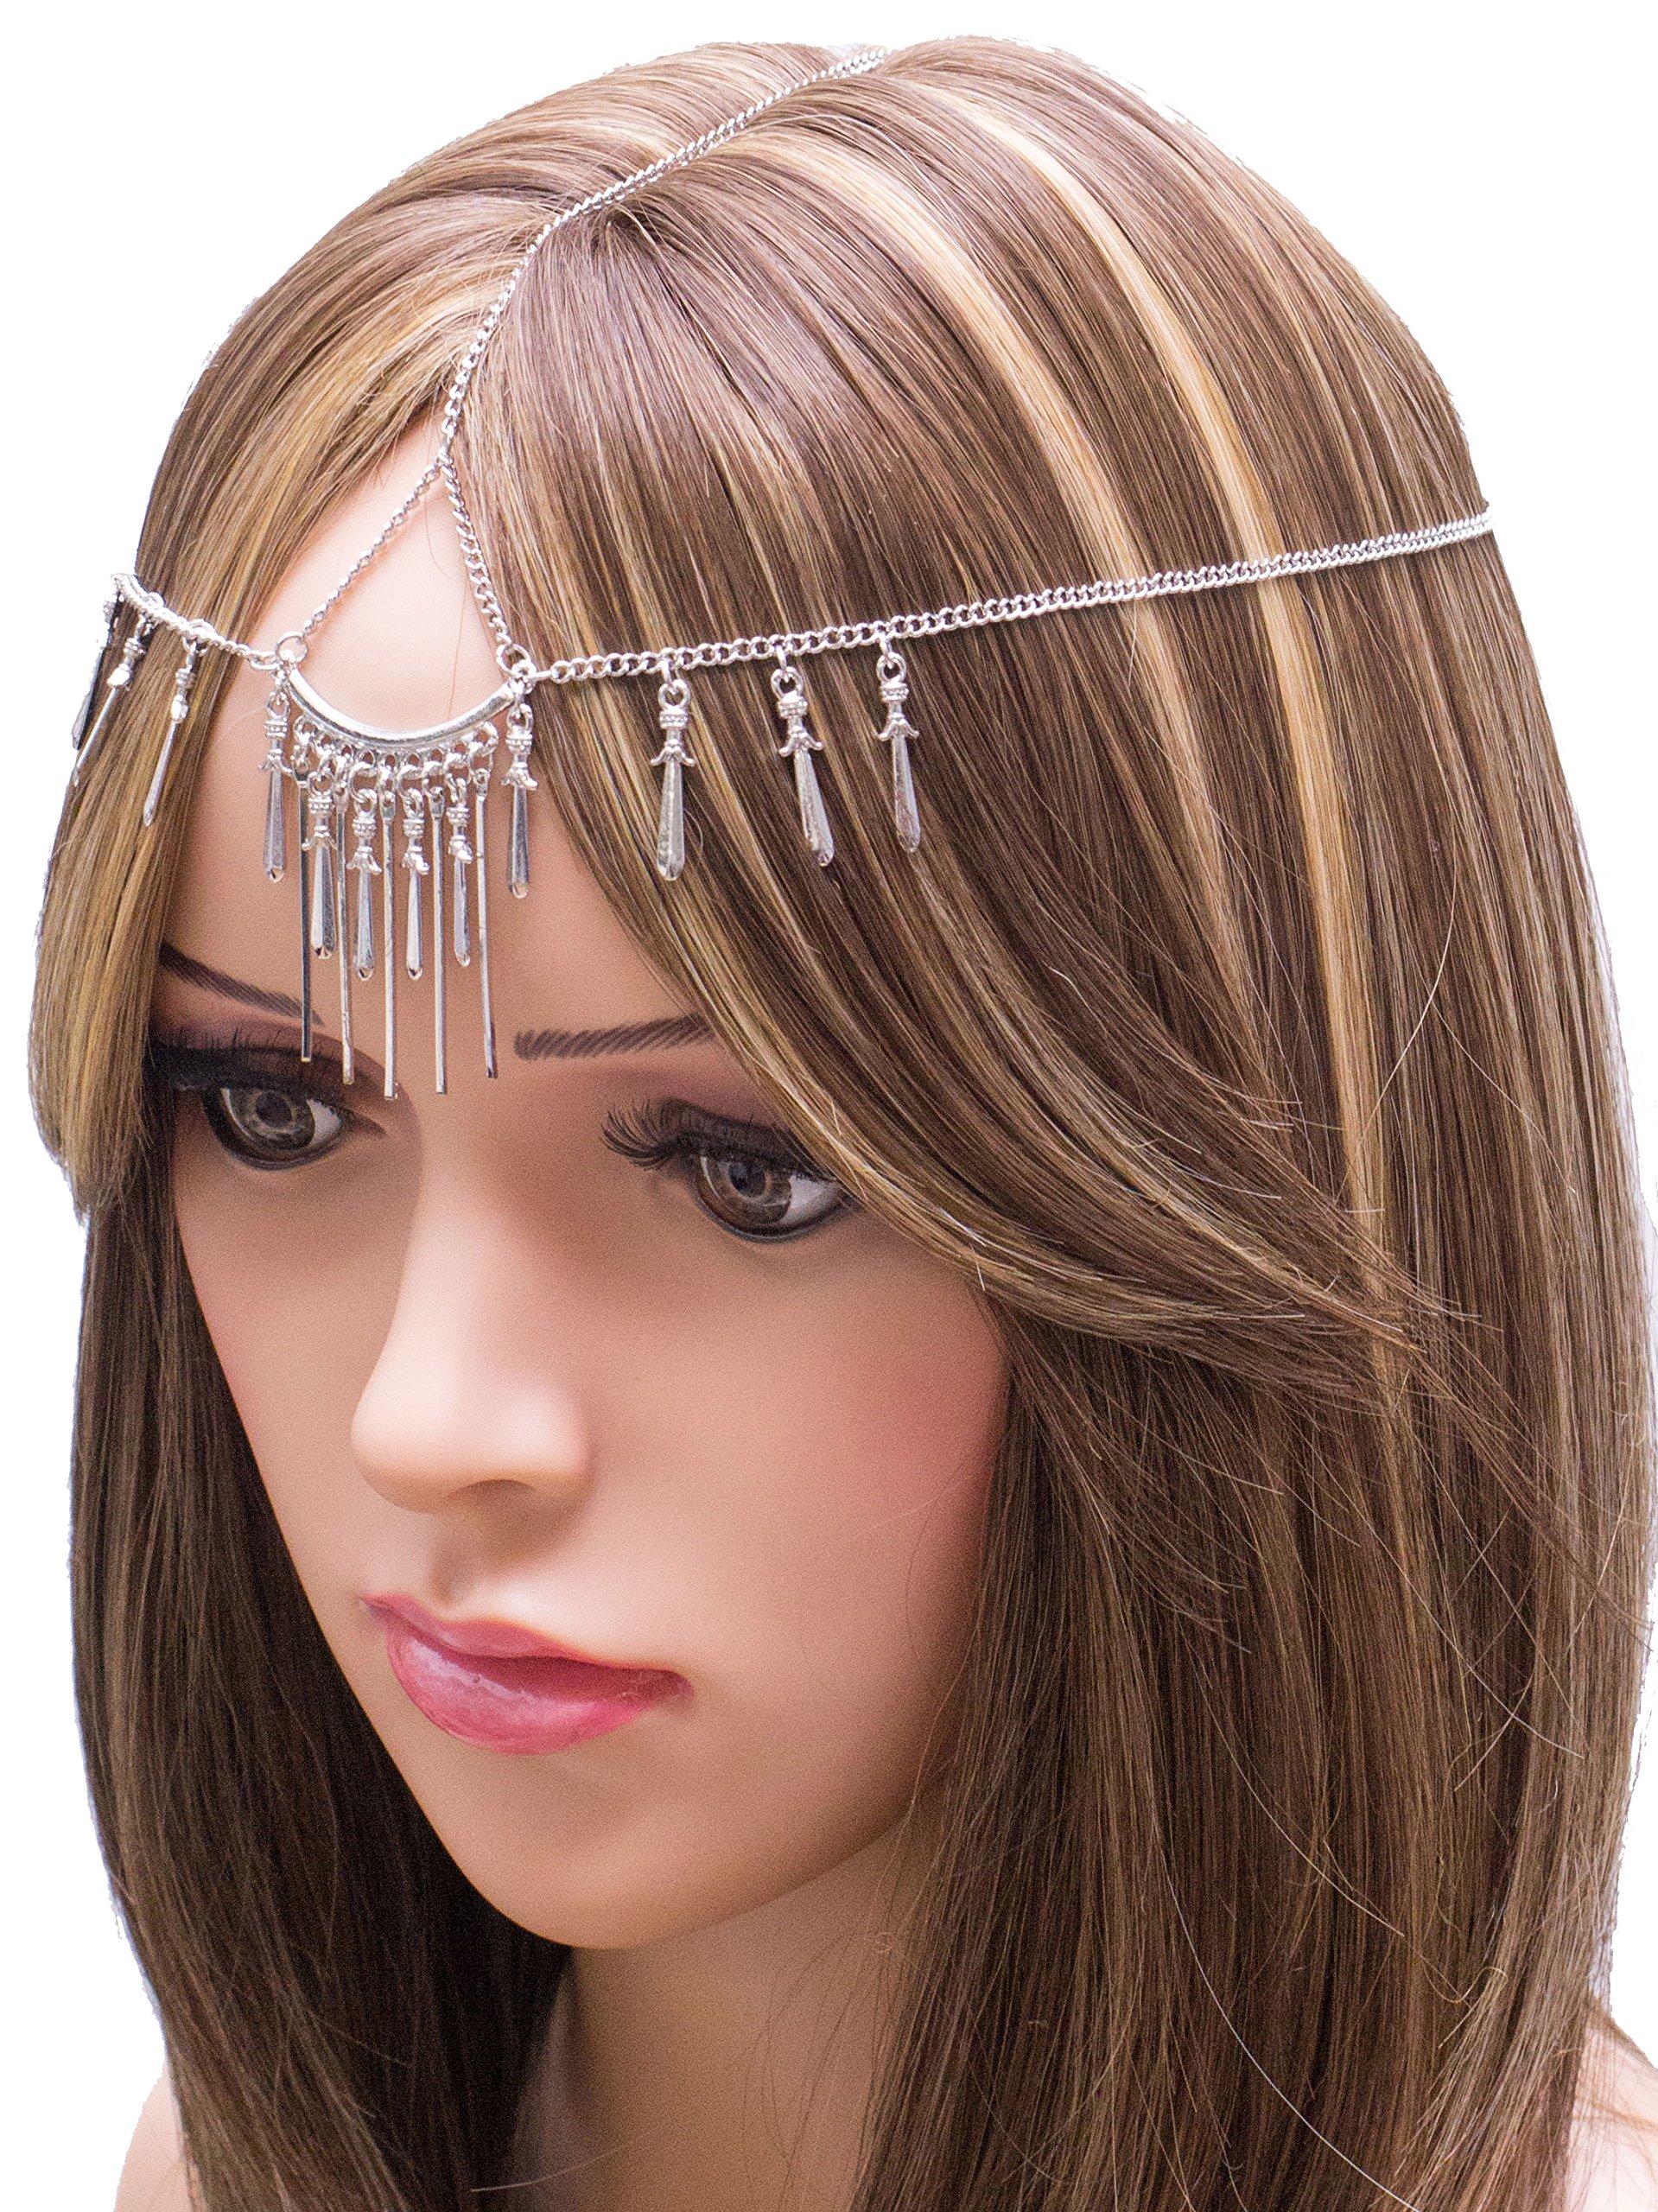 CH0217 - Beautiful Gold Plated elegant, bridal, wedding, bohemian head chain for Women (SILVER)